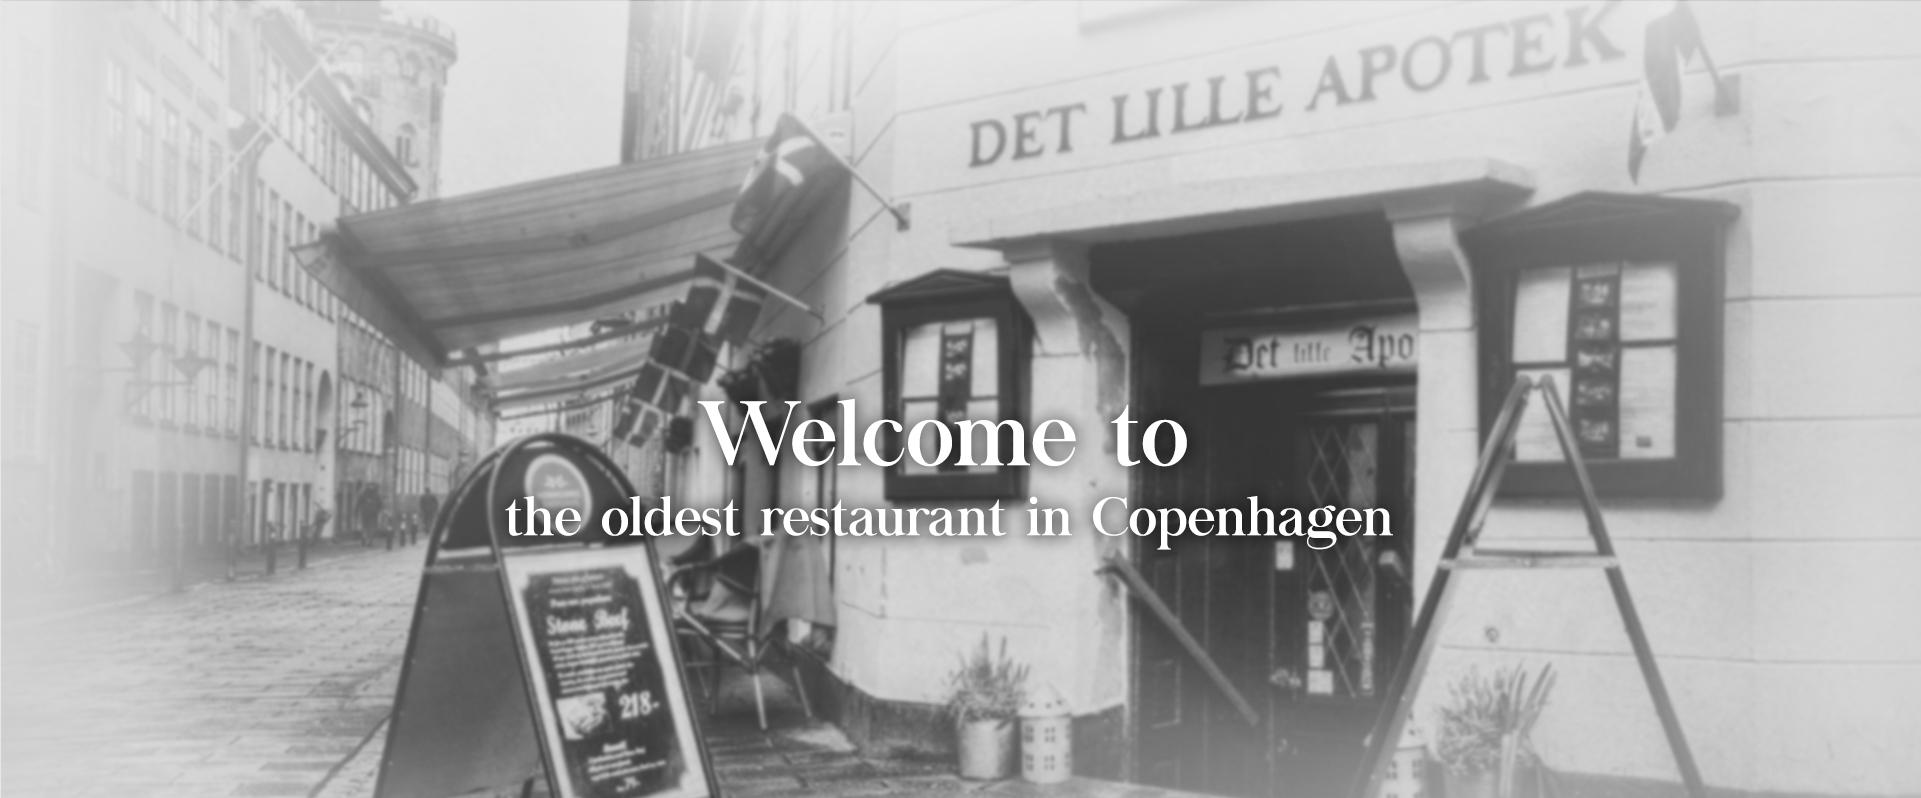 The oldest restaurant in Copenhagen